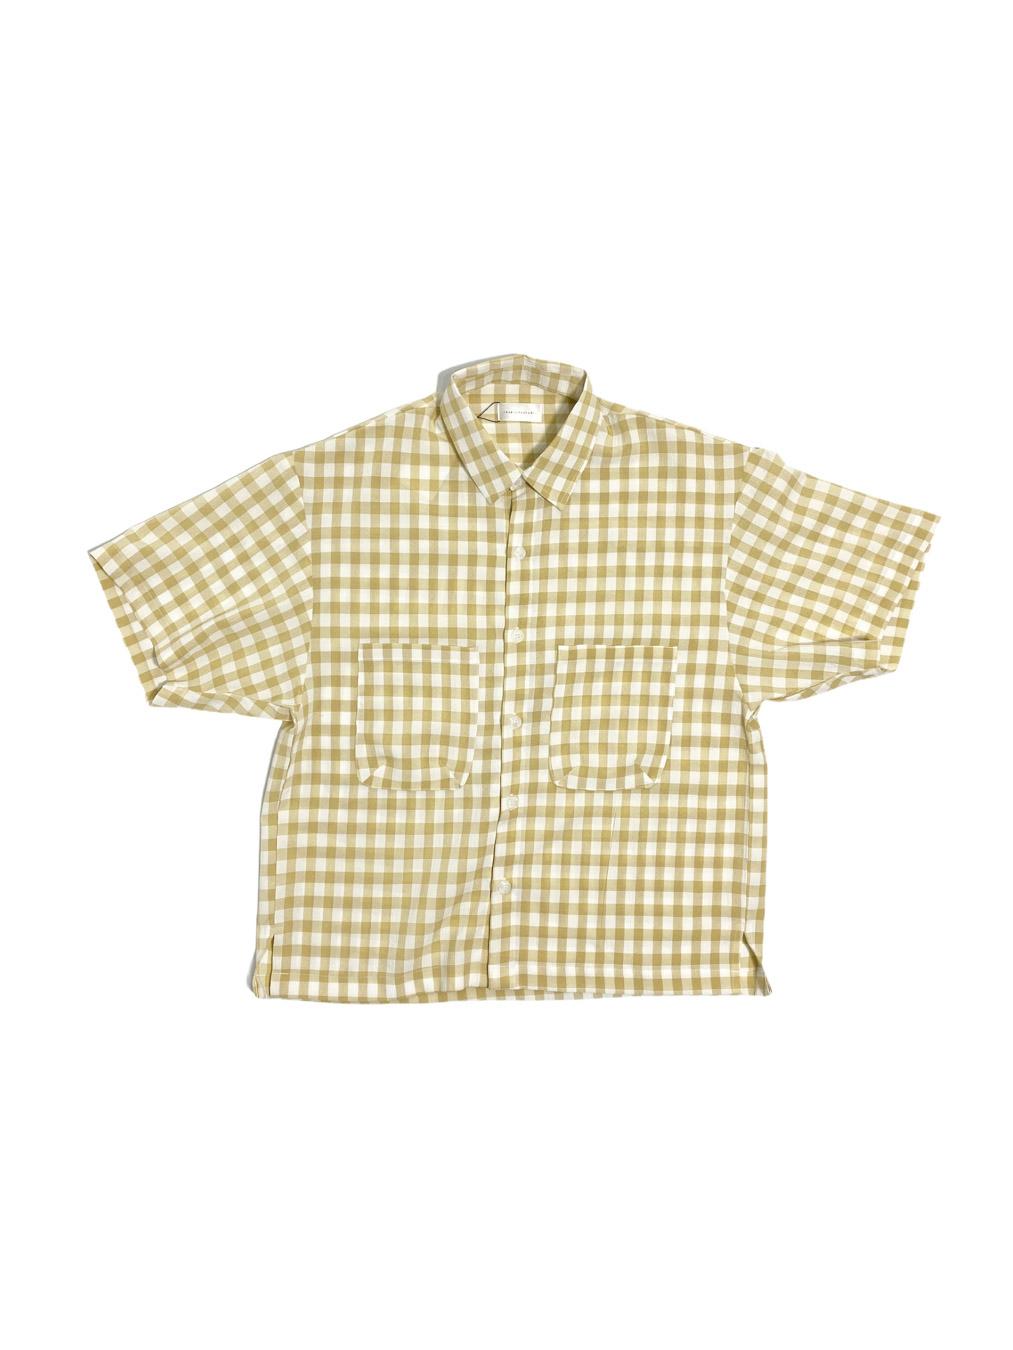 Lover Short Sleeves Shirt